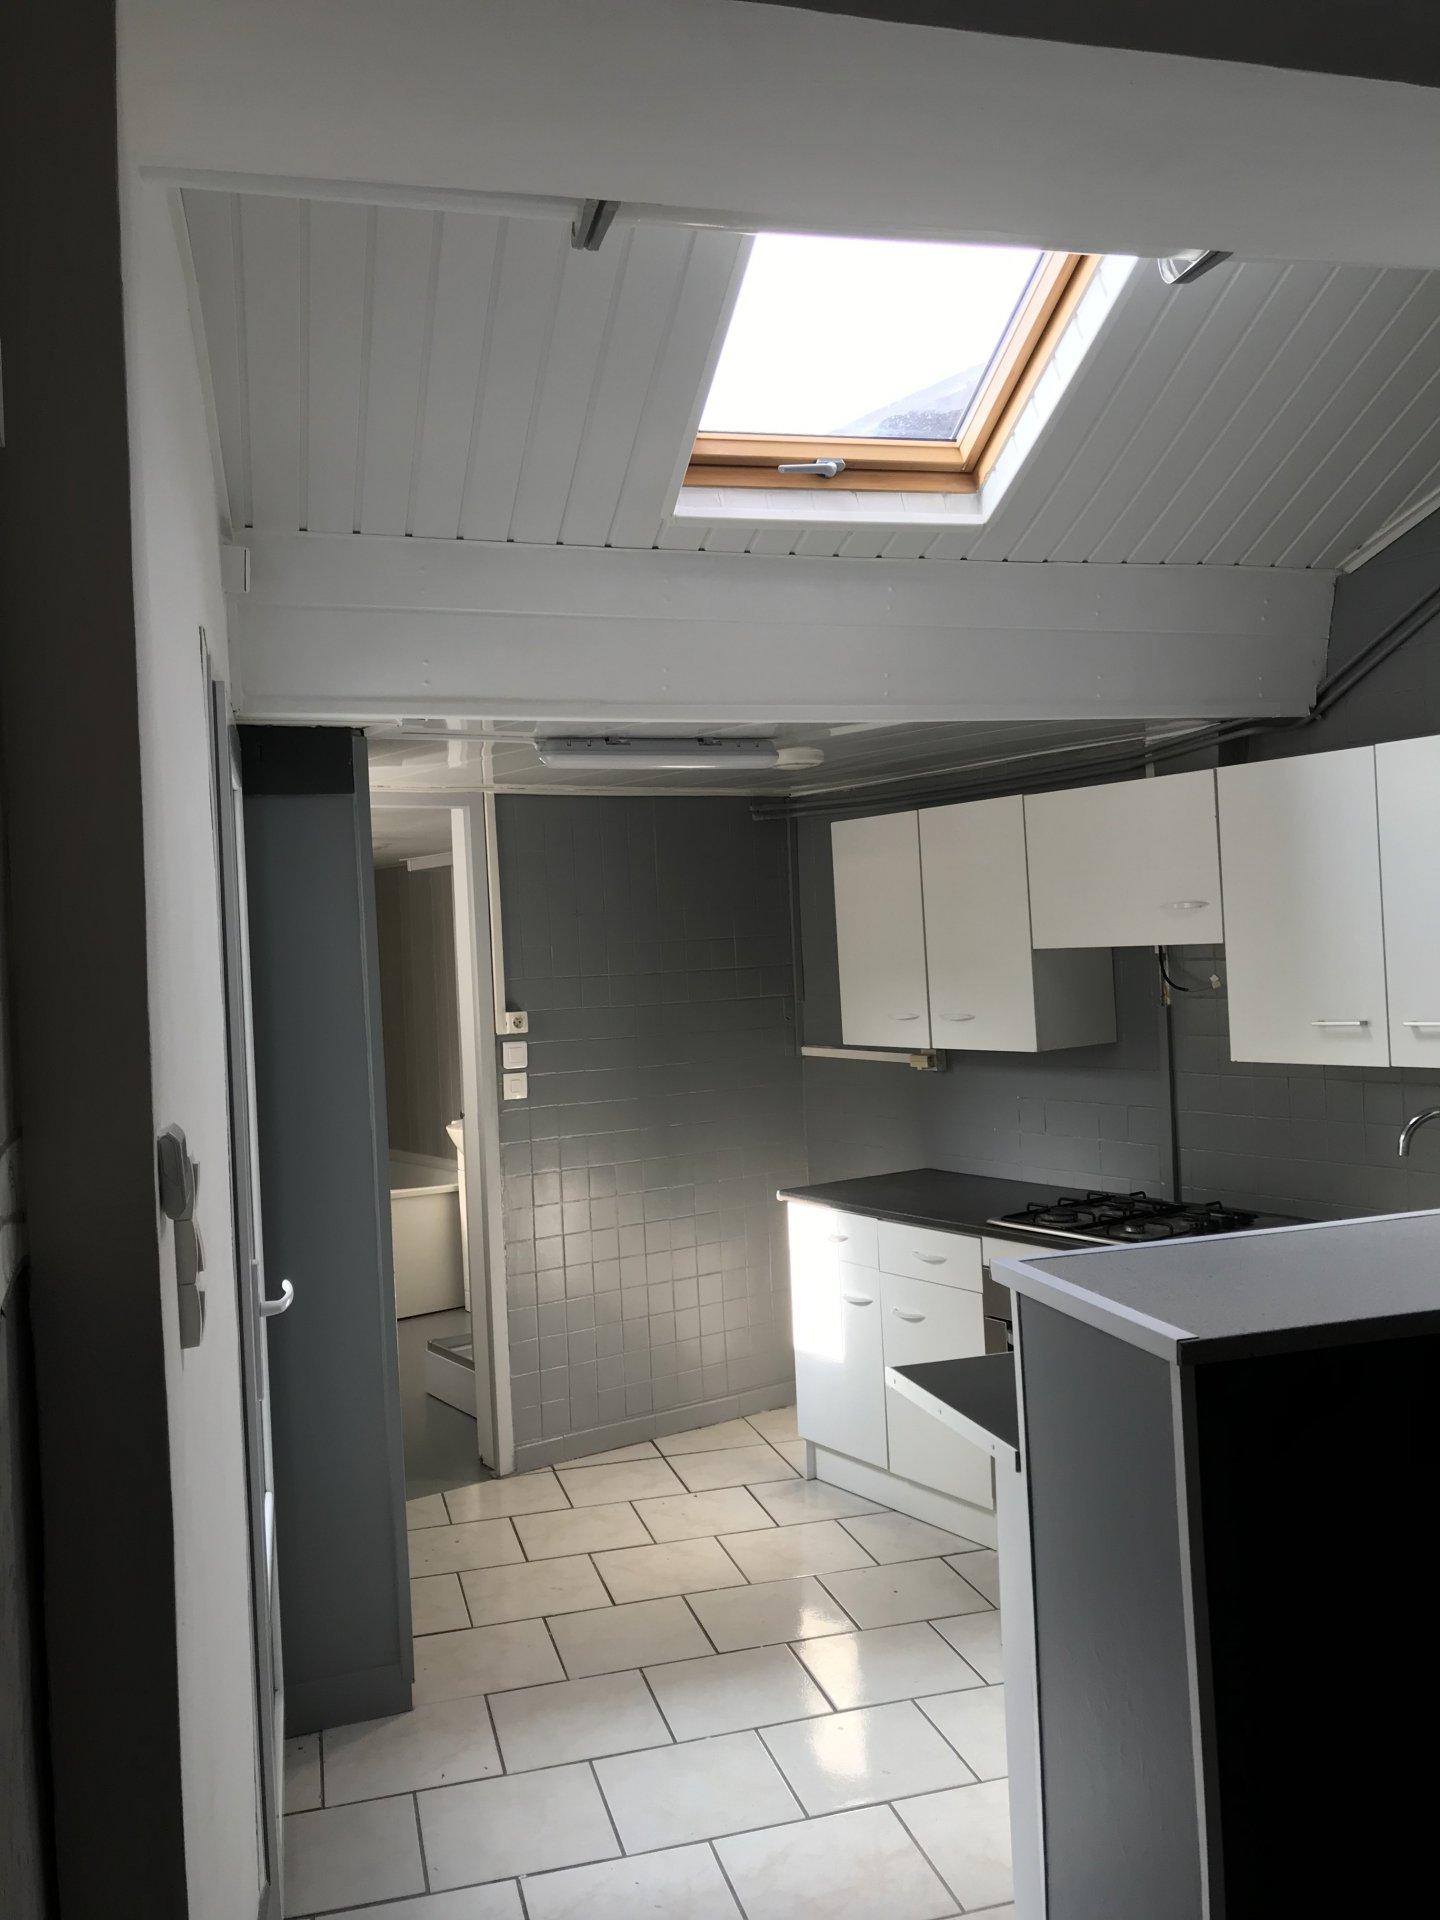 Fenêtre de toit, acier inoxydable